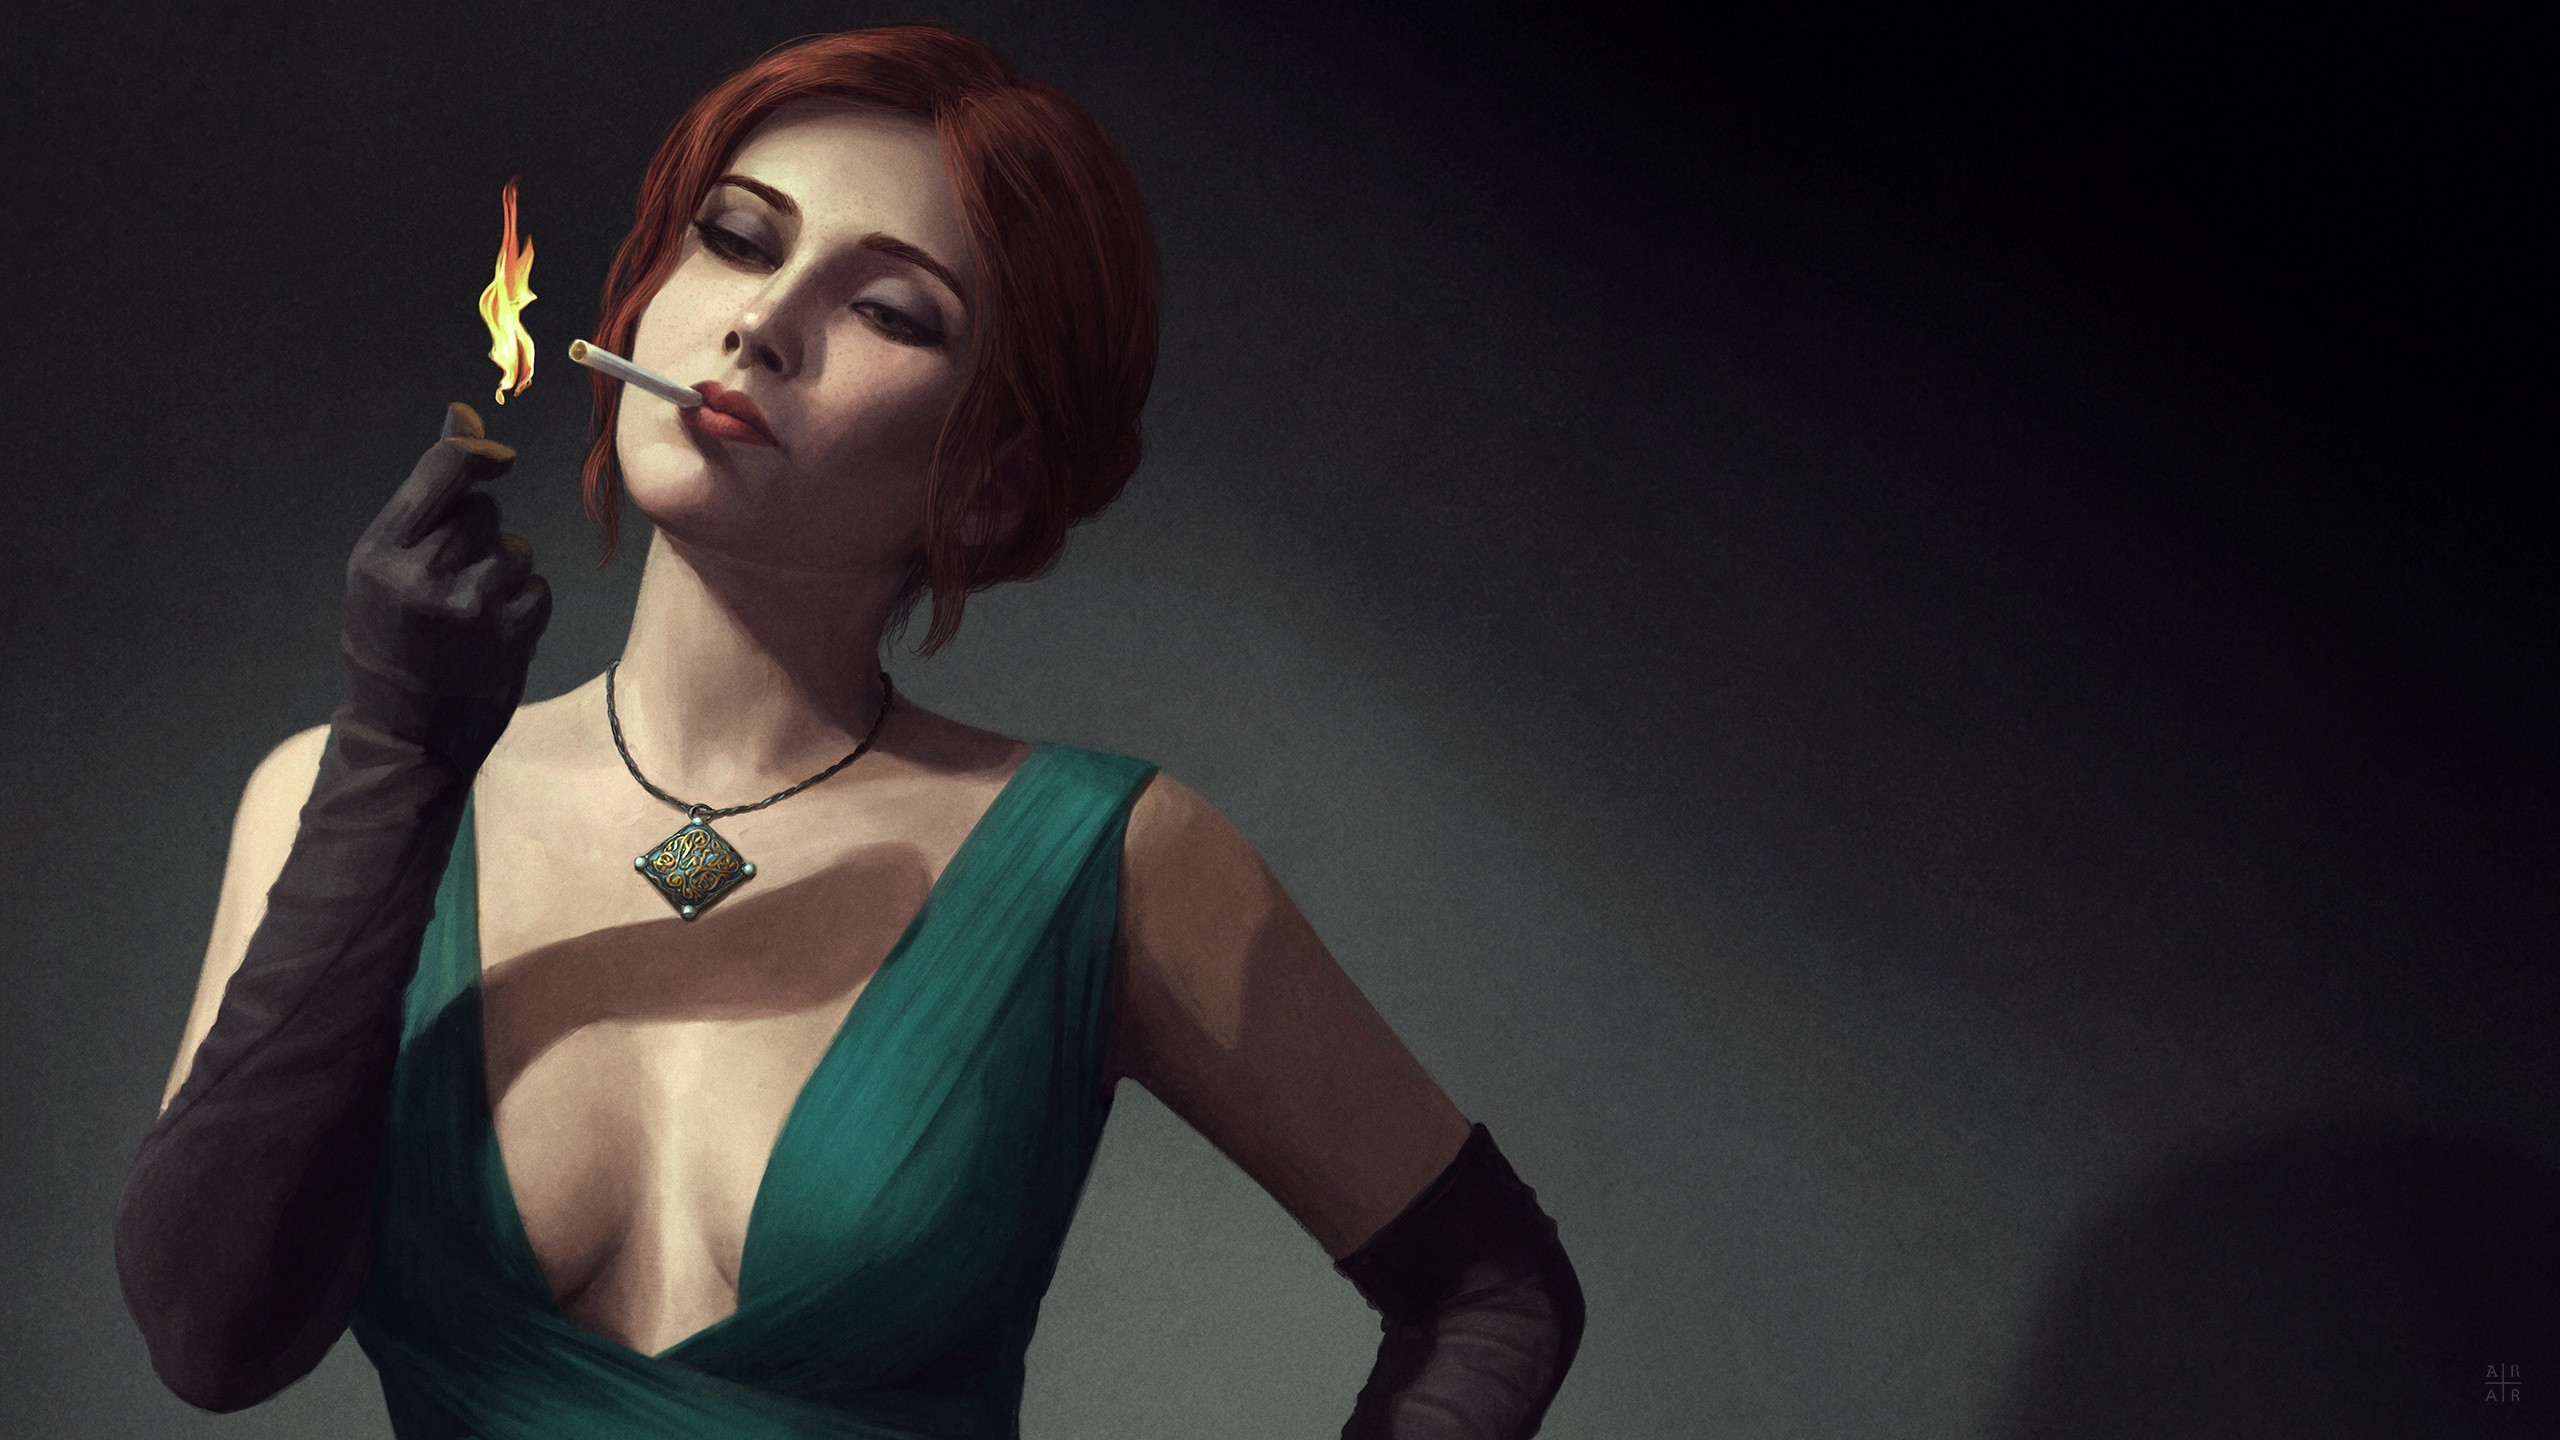 Triss Merigold, The Witcher, The Witcher 3: Wild Hunt, Artwork, Digital  art, Noir Wallpapers HD / Desktop and Mobile Backgrounds